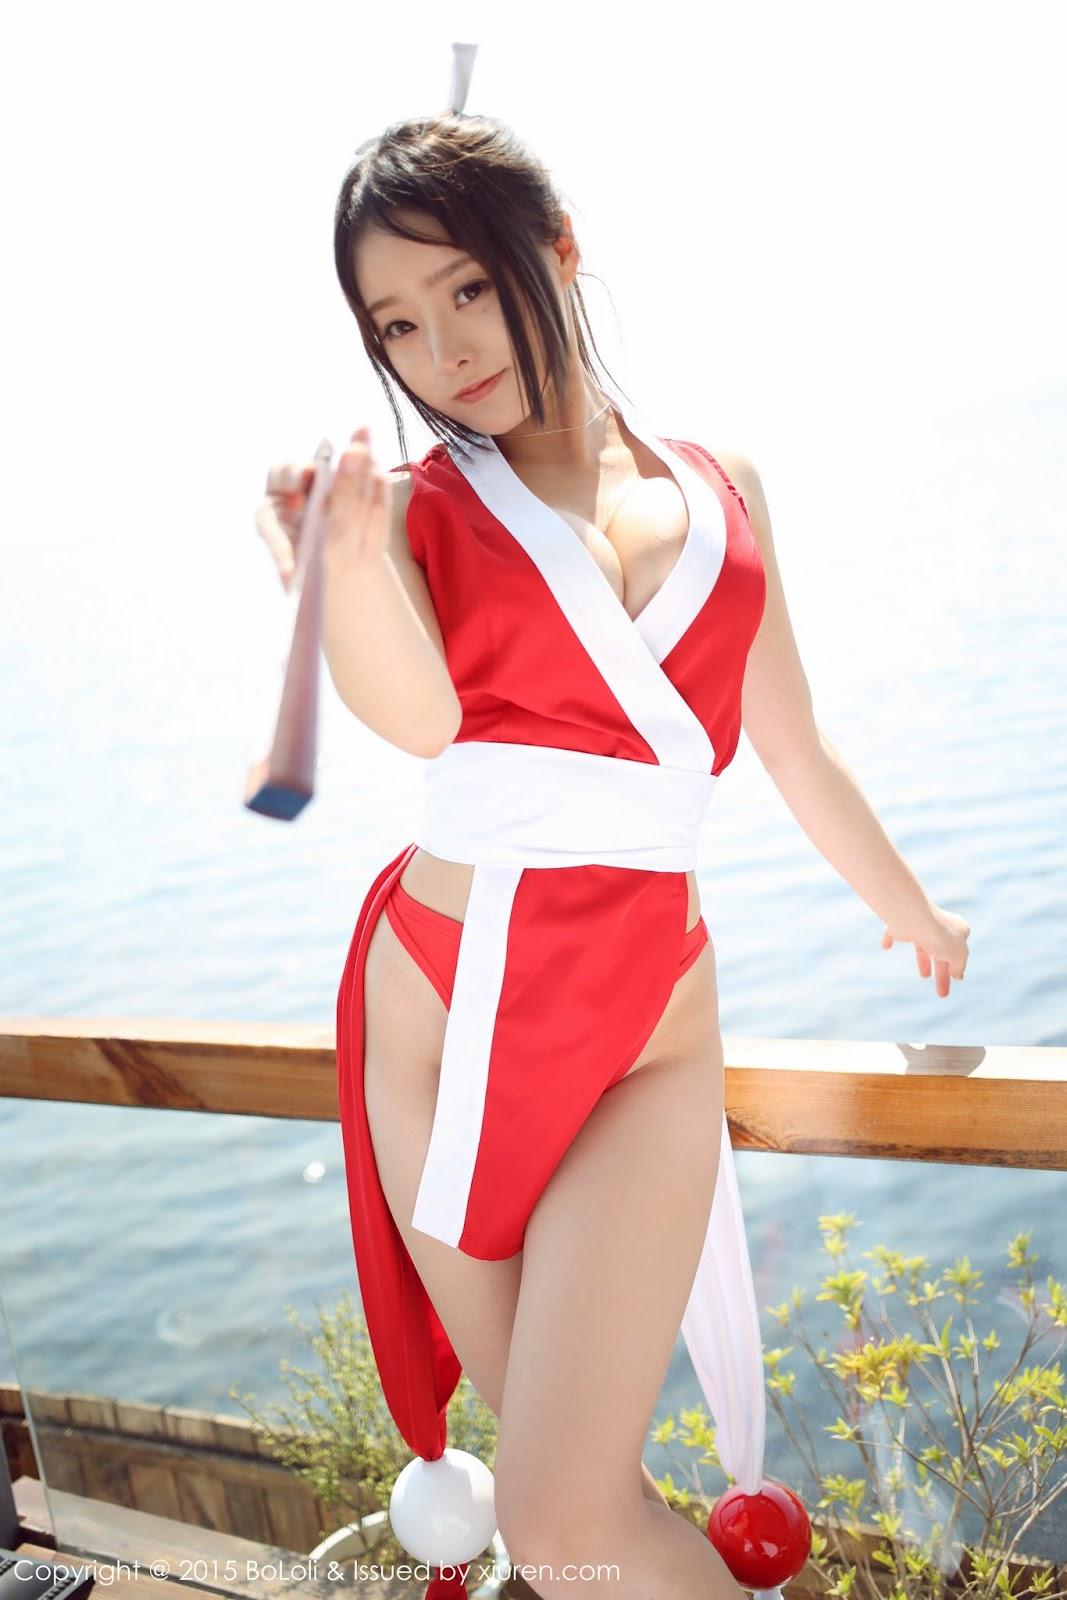 0011 - BOLOLI VOL.17 SEVENBABY Hot Girl Nude